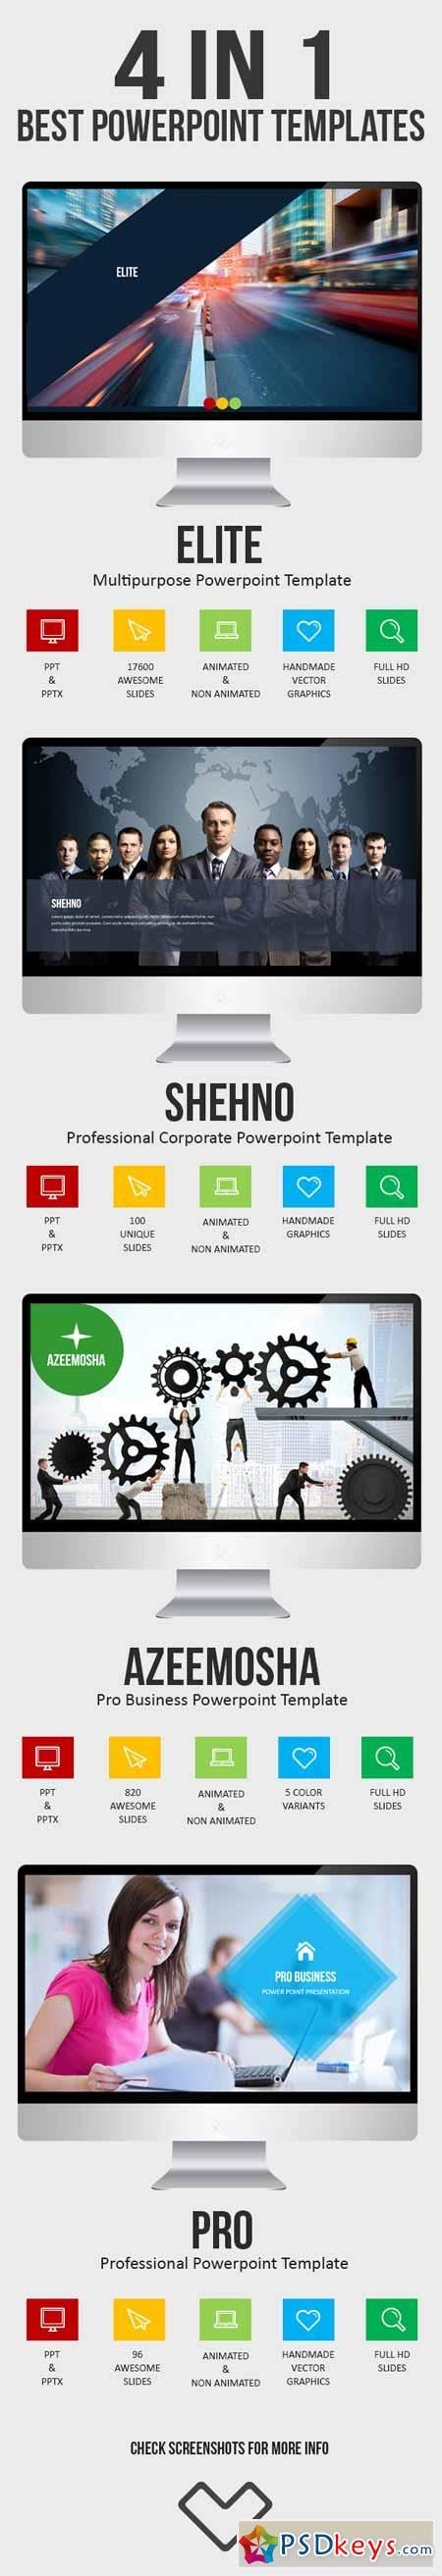 Template Powerpoint 4 In 1 Business Powerpoint Bundle 4 in 1 powerpoint bundle 10762022 187 free